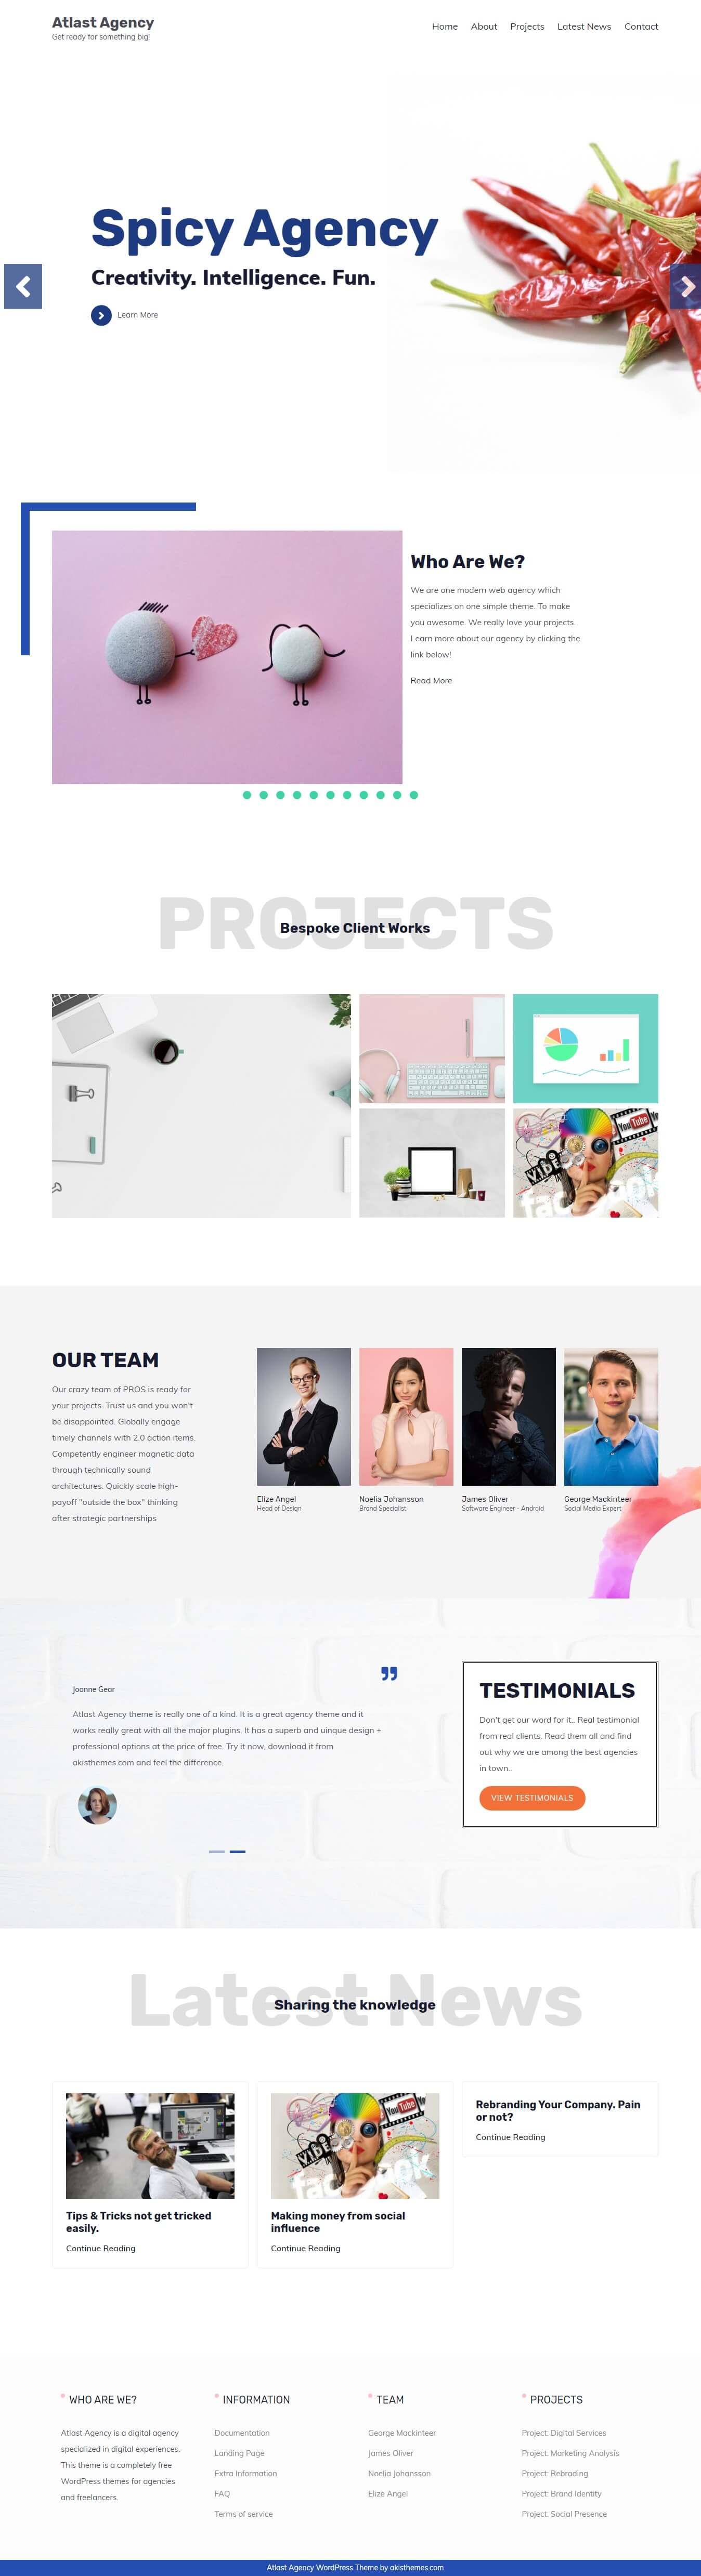 Atlast Agency